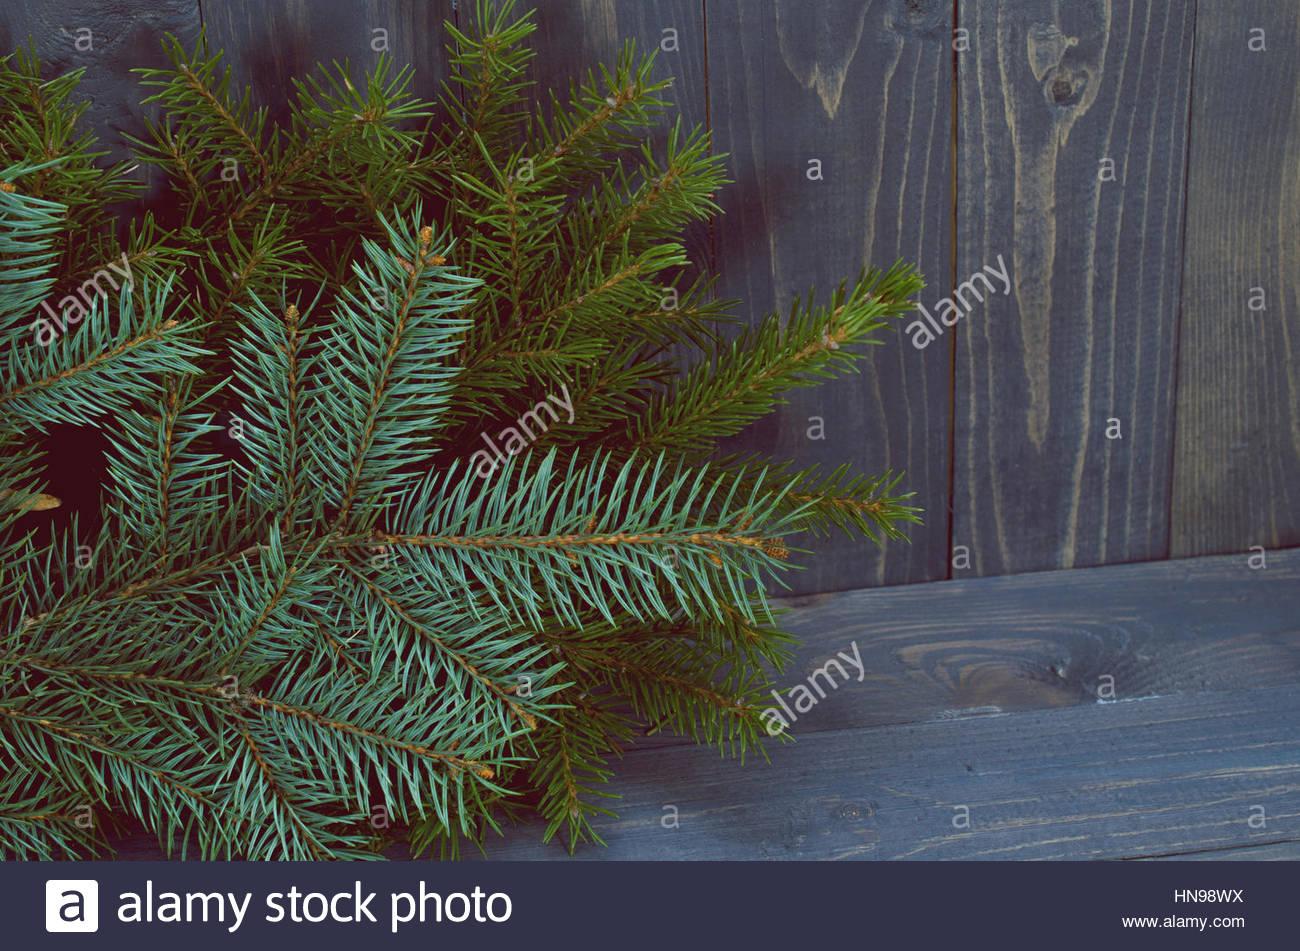 Pine Branches On Dark Wood Background Stock Photo